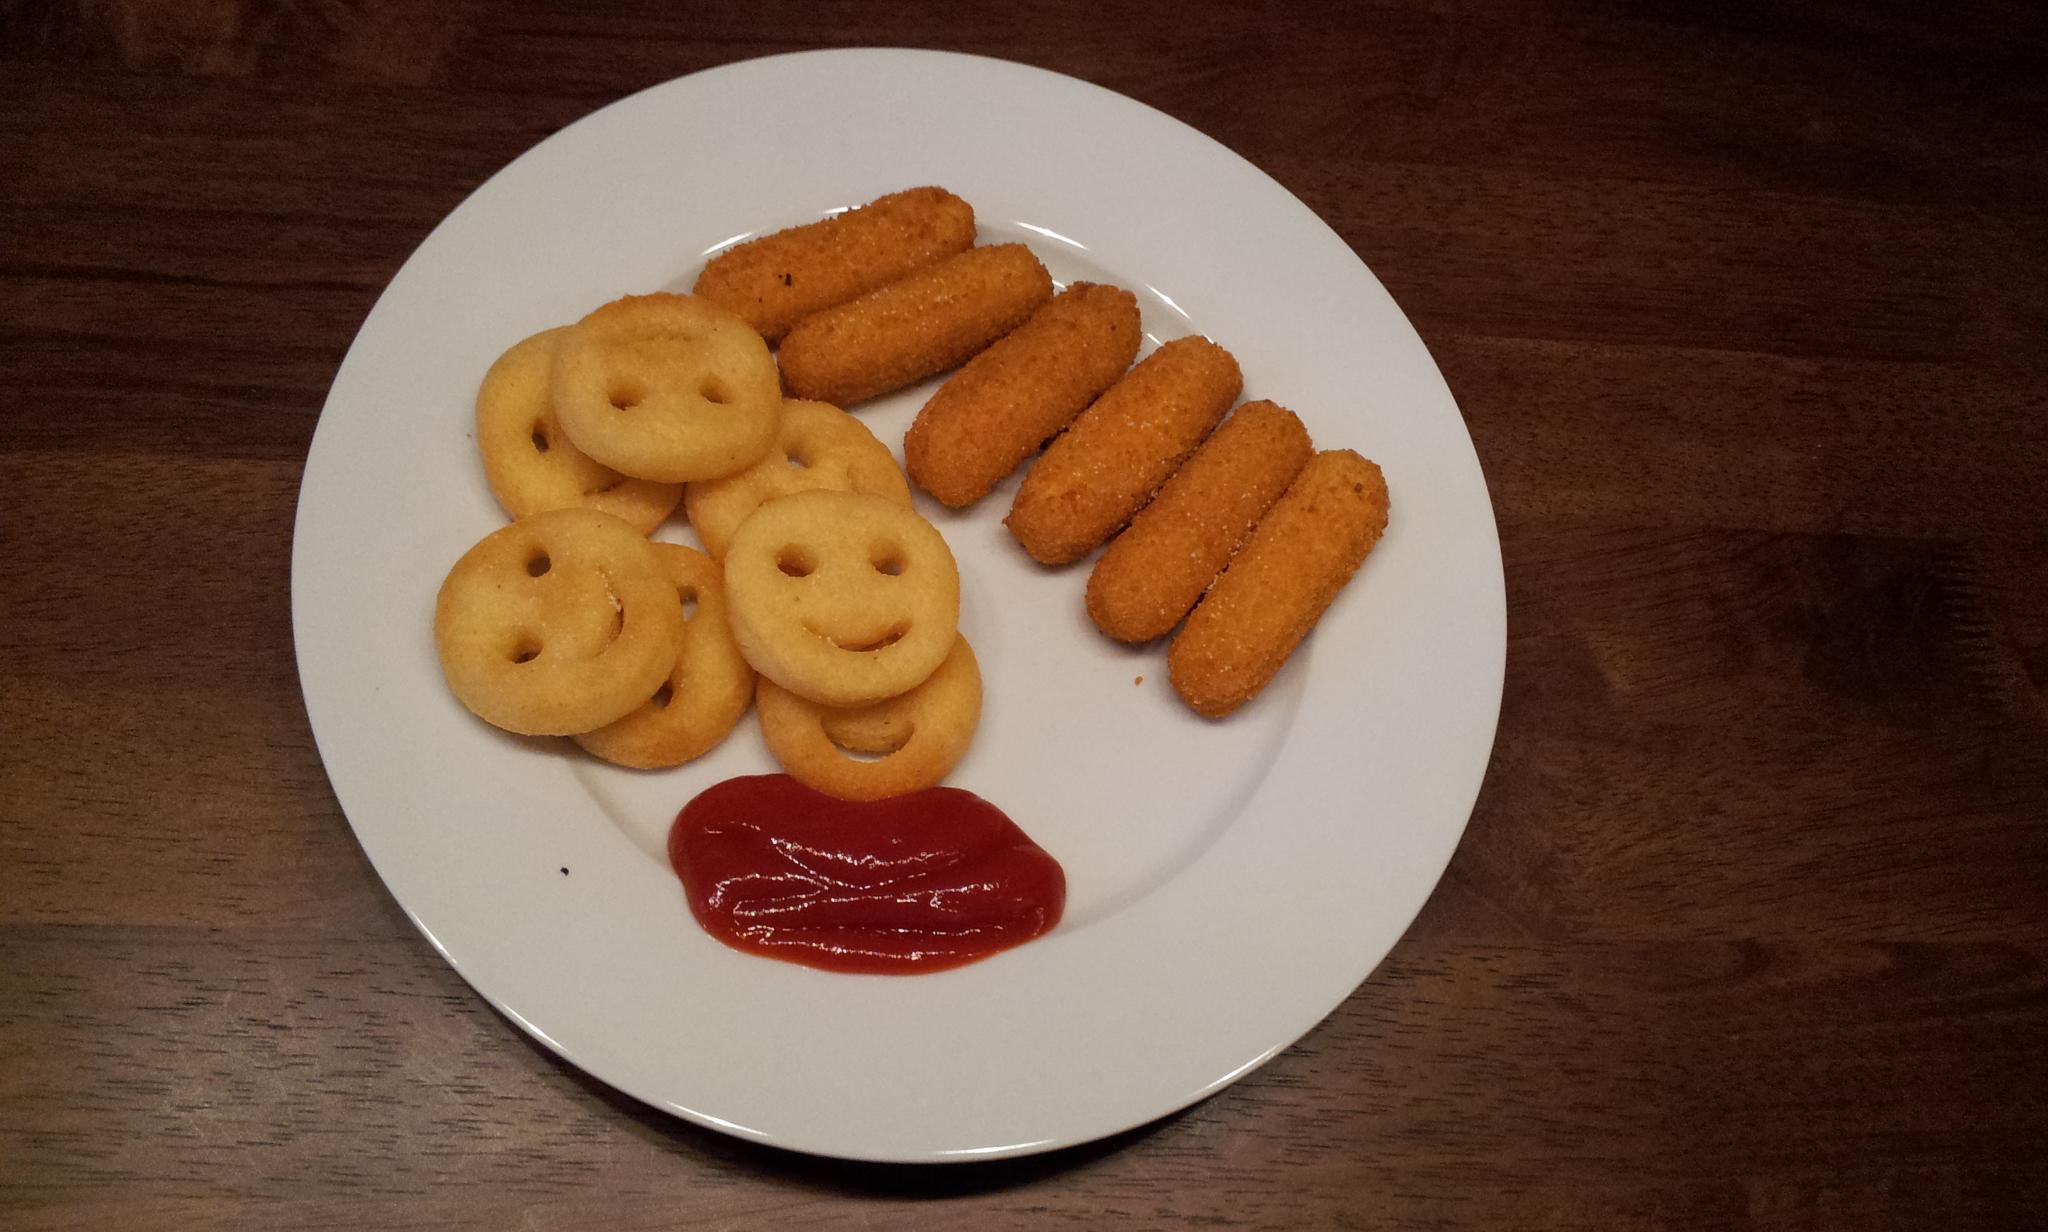 https://foodloader.net/Holz_2011-28-09_Frischkaesesticks_mit_Smiles.jpg